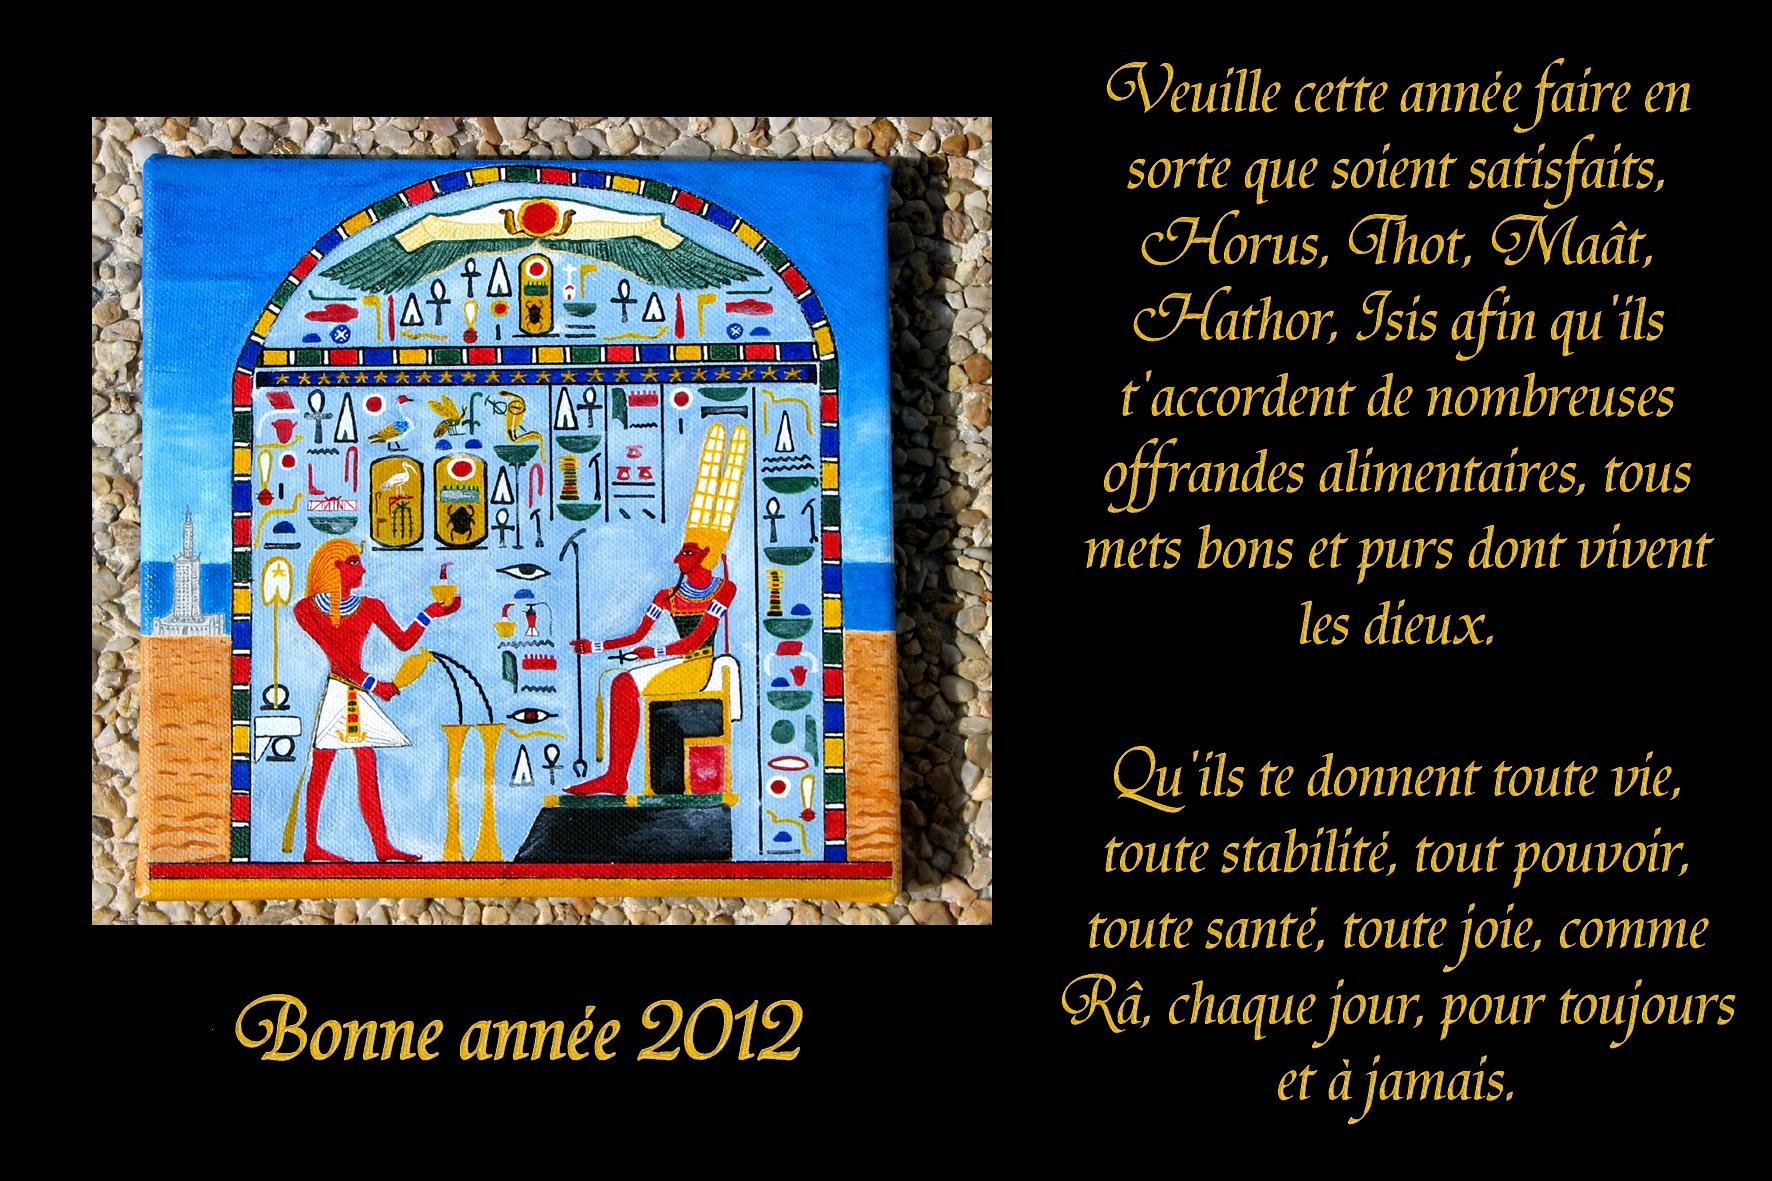 http://hieroglyphe.djehouty.free.fr/hieroglyphes/carte_nouvel_an_12.jpg